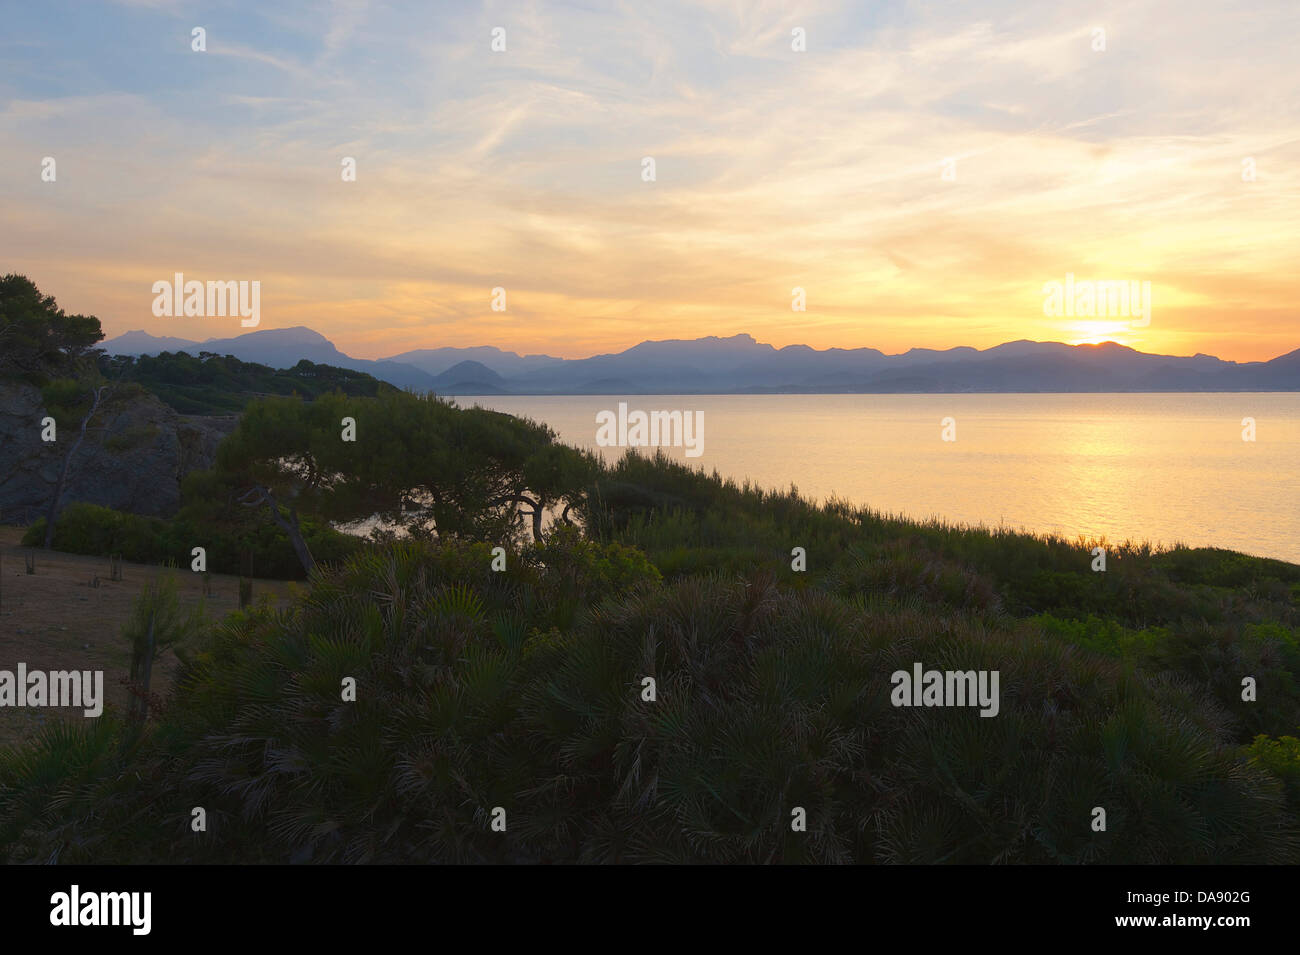 Balearic Islands, Majorca, Mallorca, Spain, Europe, outside, Alcudia, coast, seashore, coasts, seashores, coastal - Stock Image